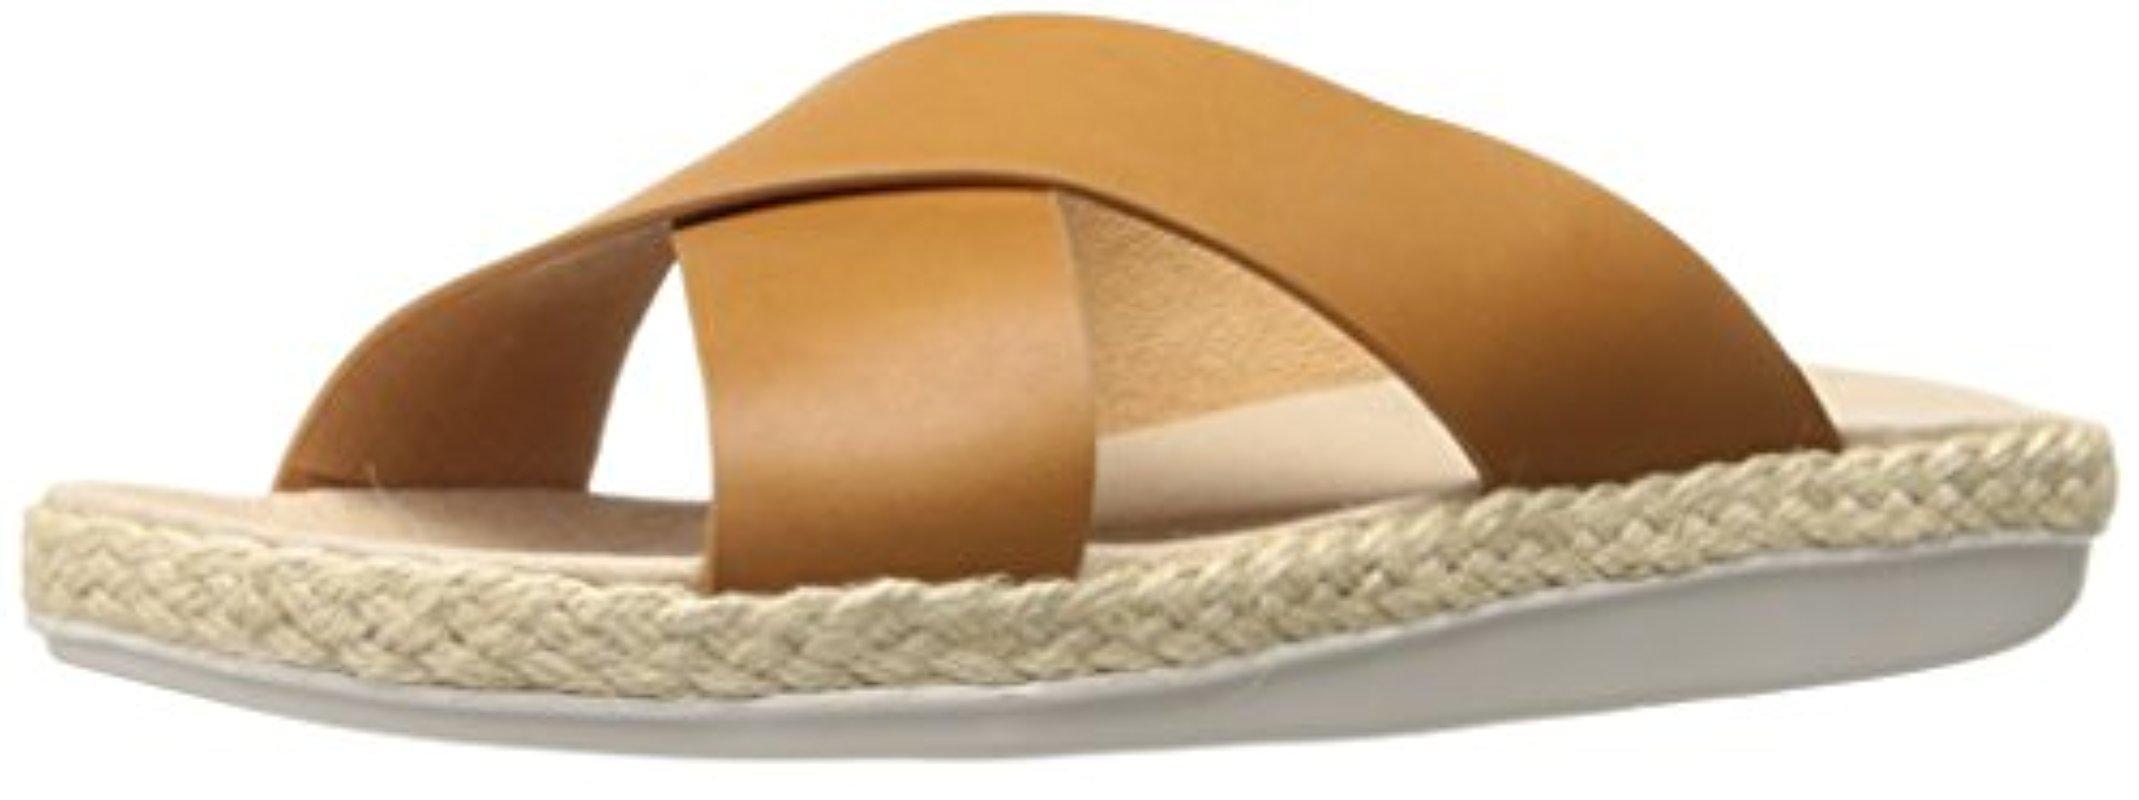 9fc393a5ec79 Lyst - Tommy Bahama Relaxology Ilidah Slide Sandal - Save ...